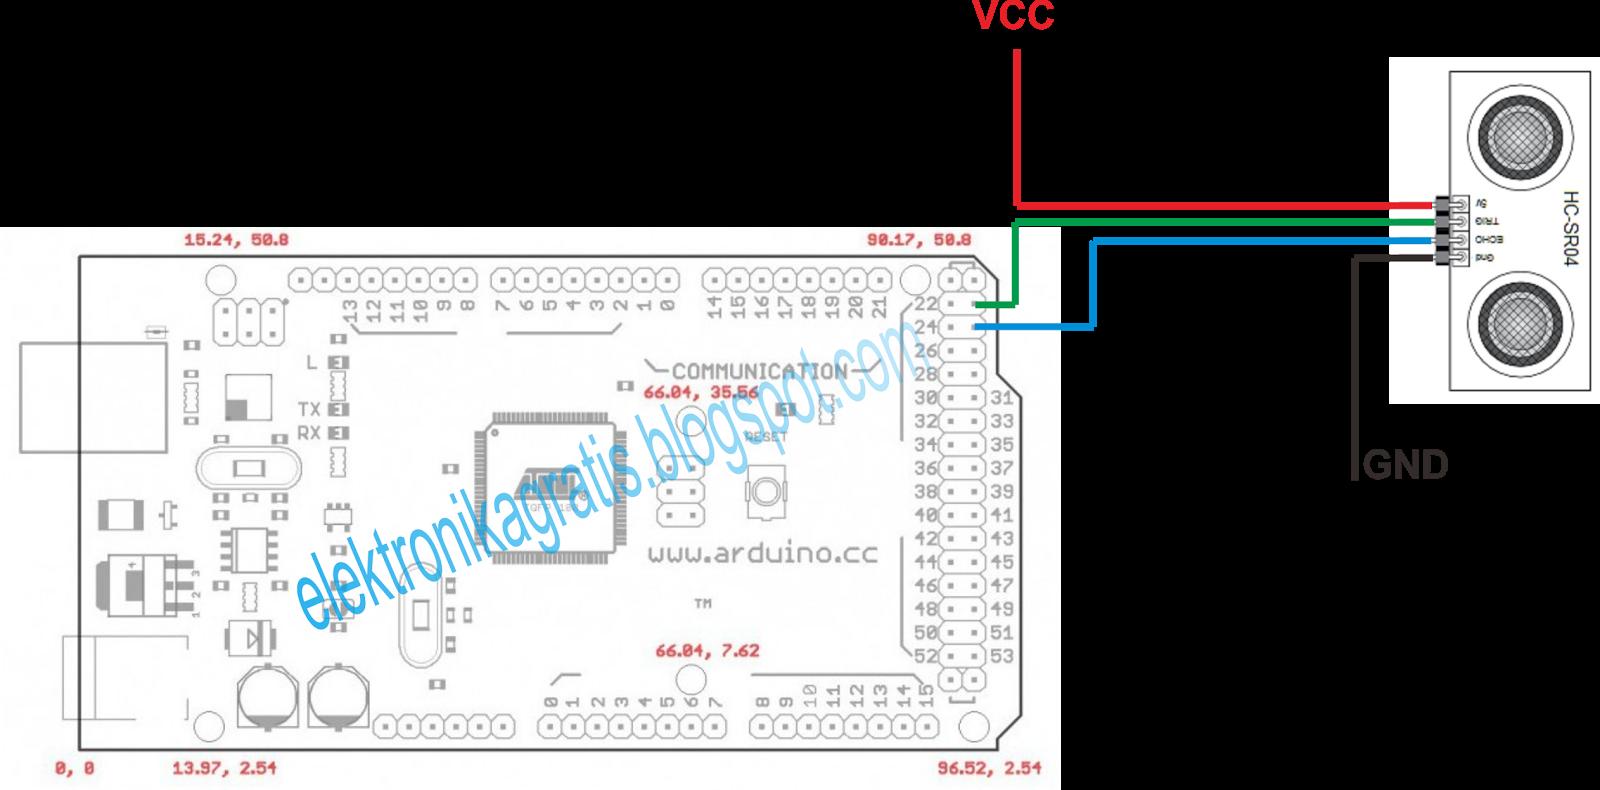 Elektronika Gratis Tutorial Arduino Indonesia Sensor Ultrasonik Hc Sr04 Datasheet 1 Hal Yang Perlu Dilakukan Pertama Kali Adalah Merangkai Rangkaian Seperti Gambar Berikut